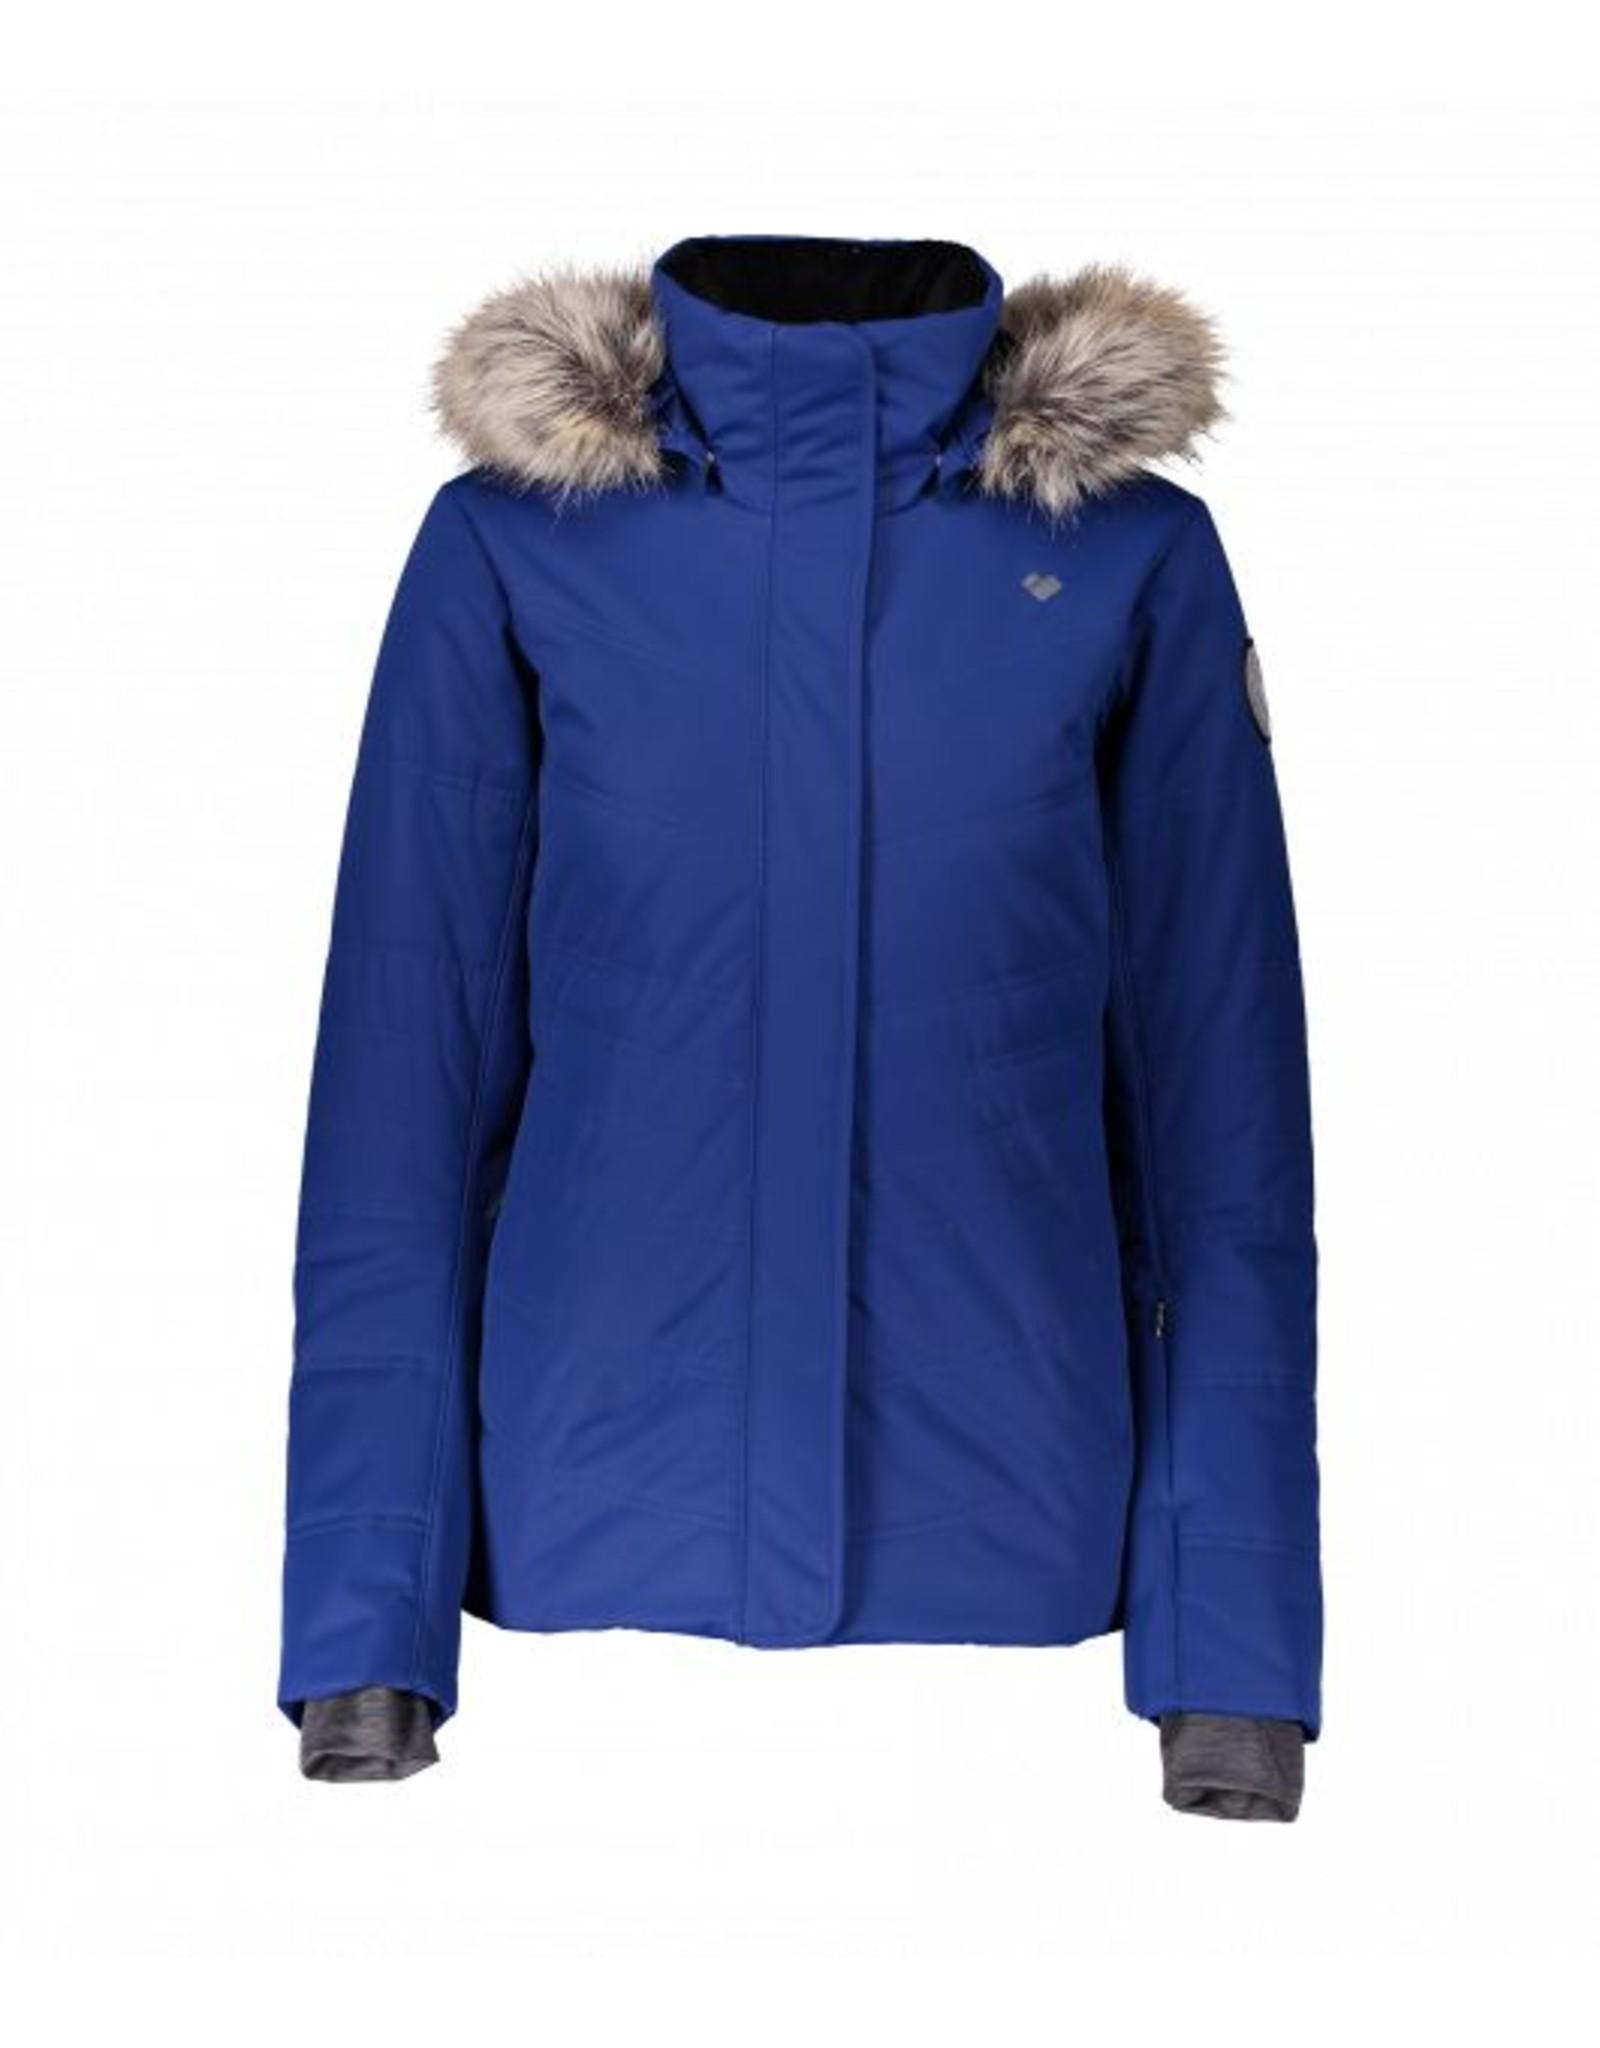 Obermeyer Obermeyer Women's Tuscany II Jacket 2019